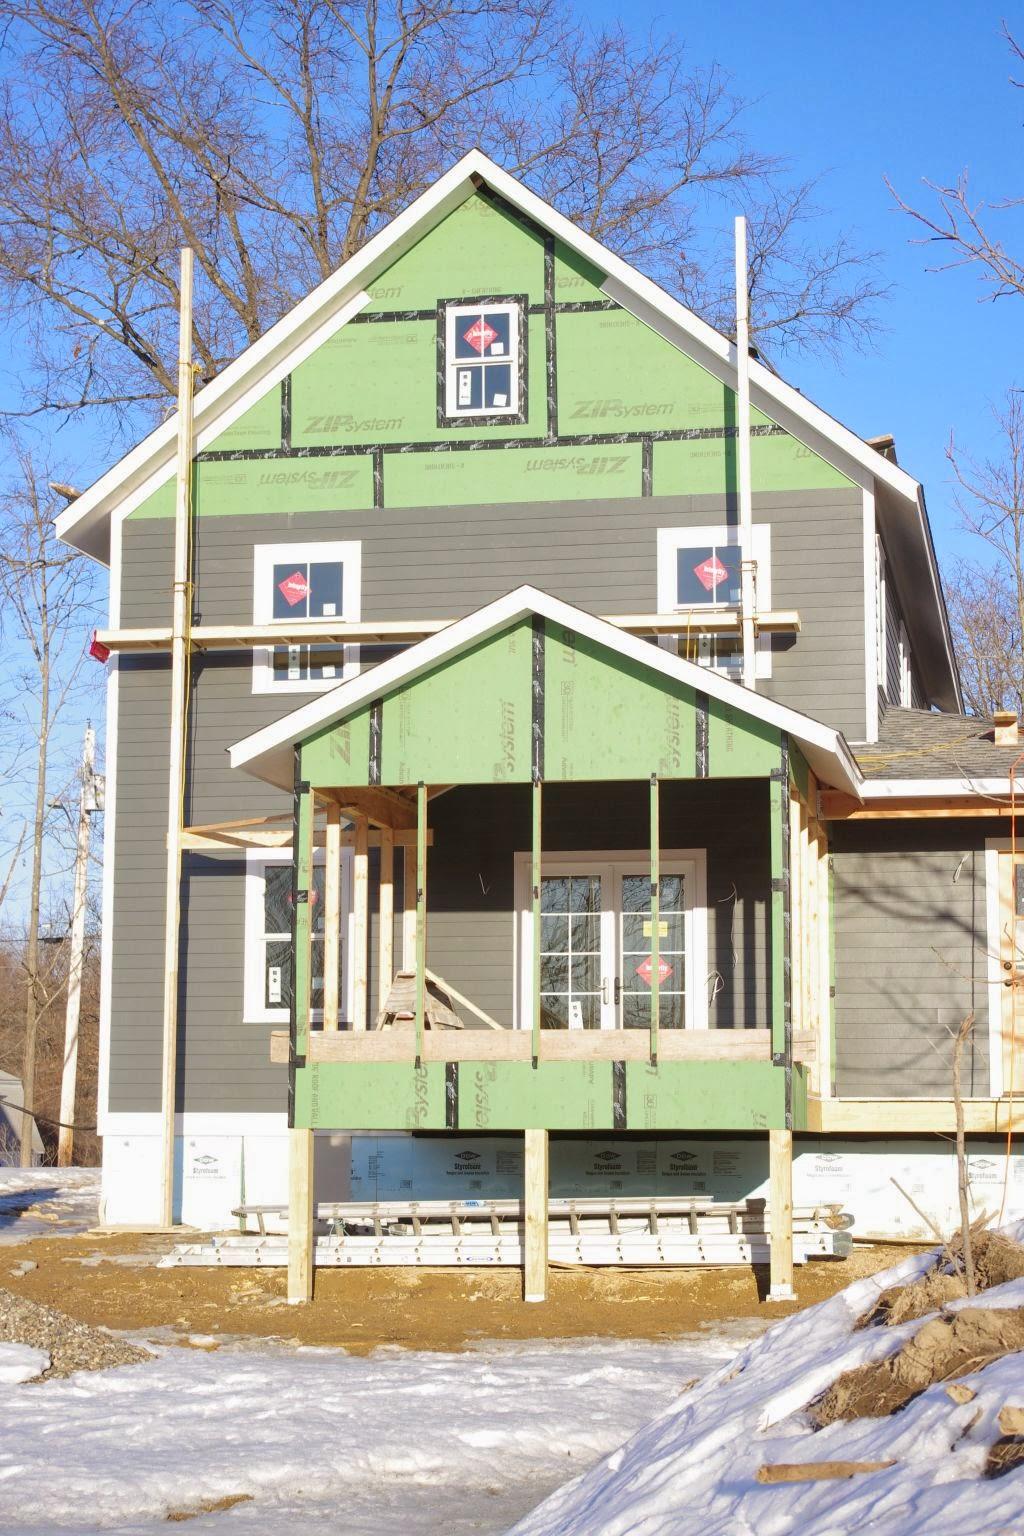 The New House Next Door Scaffolding